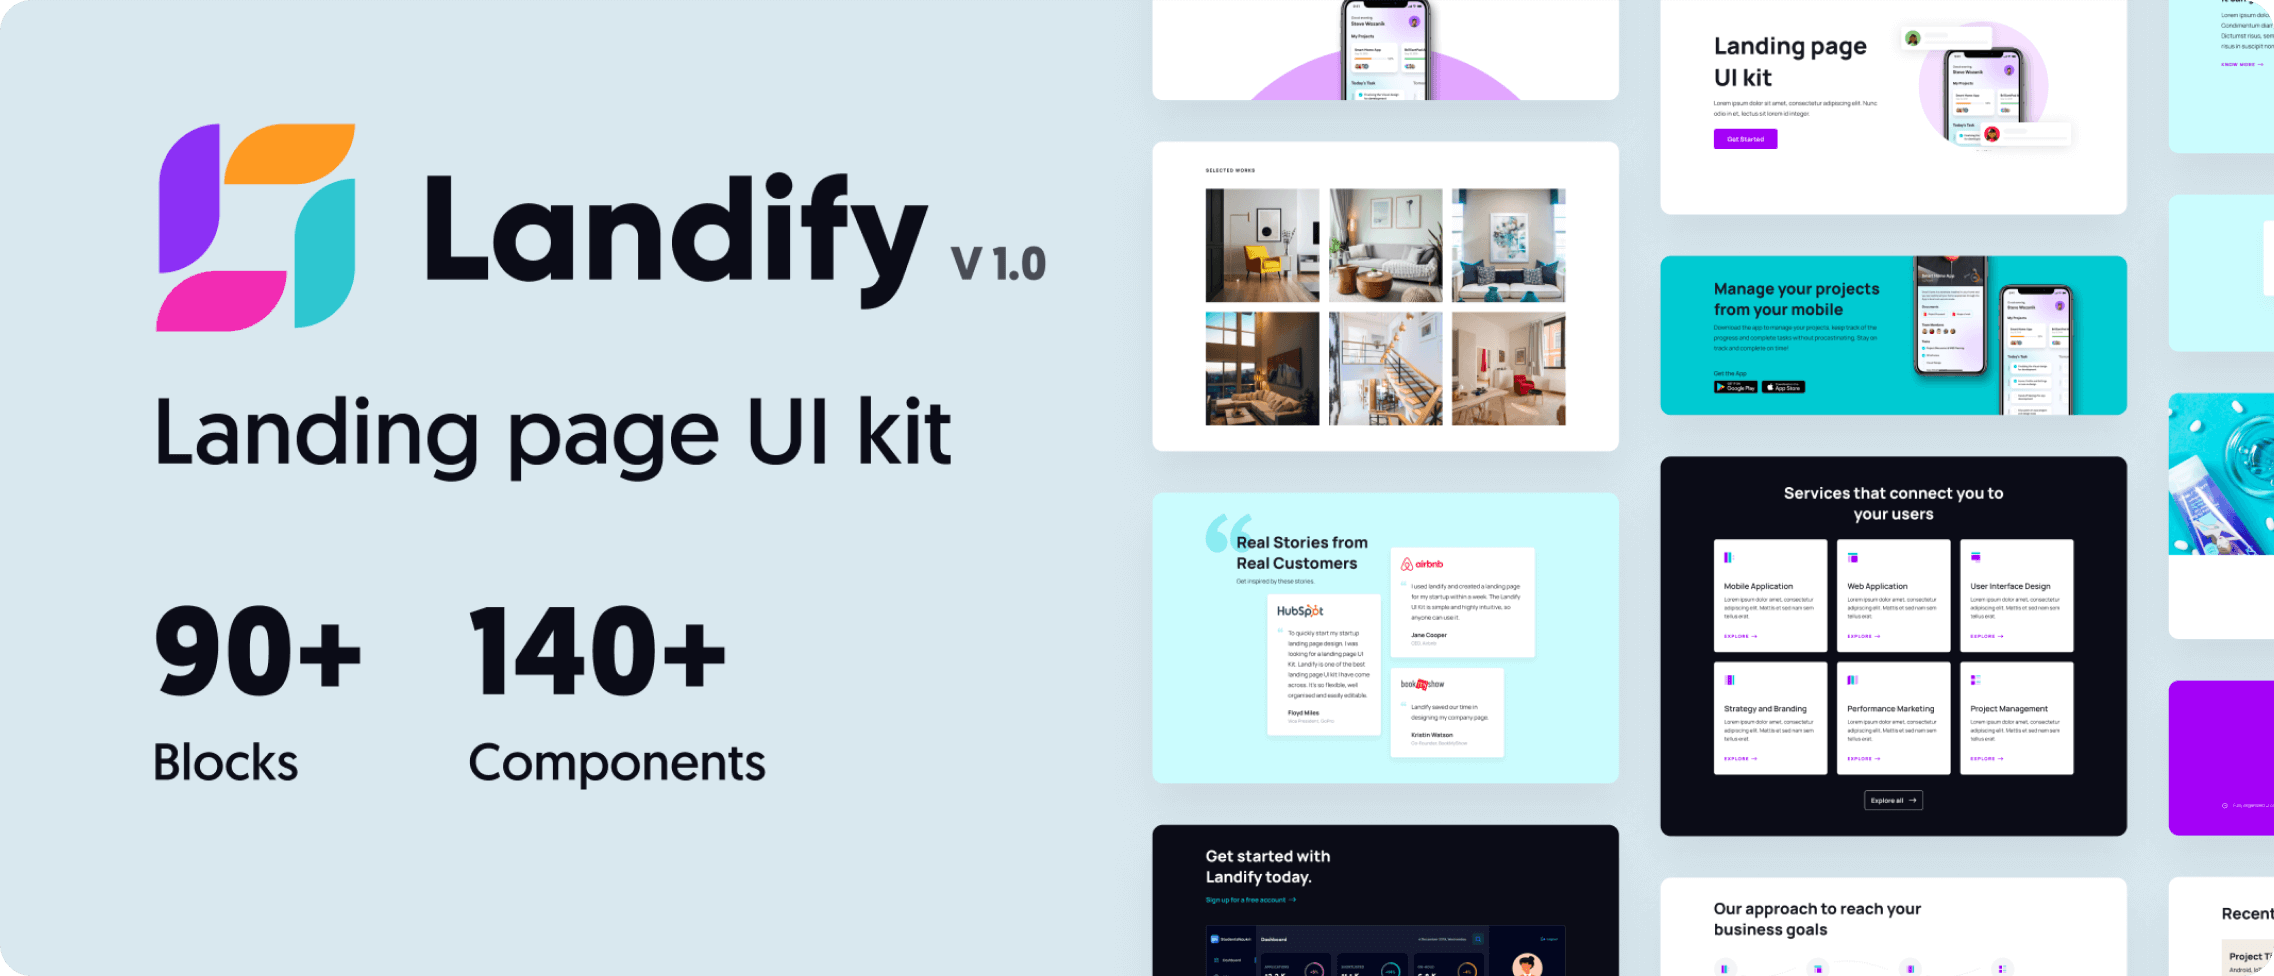 Landify UI kit sample screenshots.